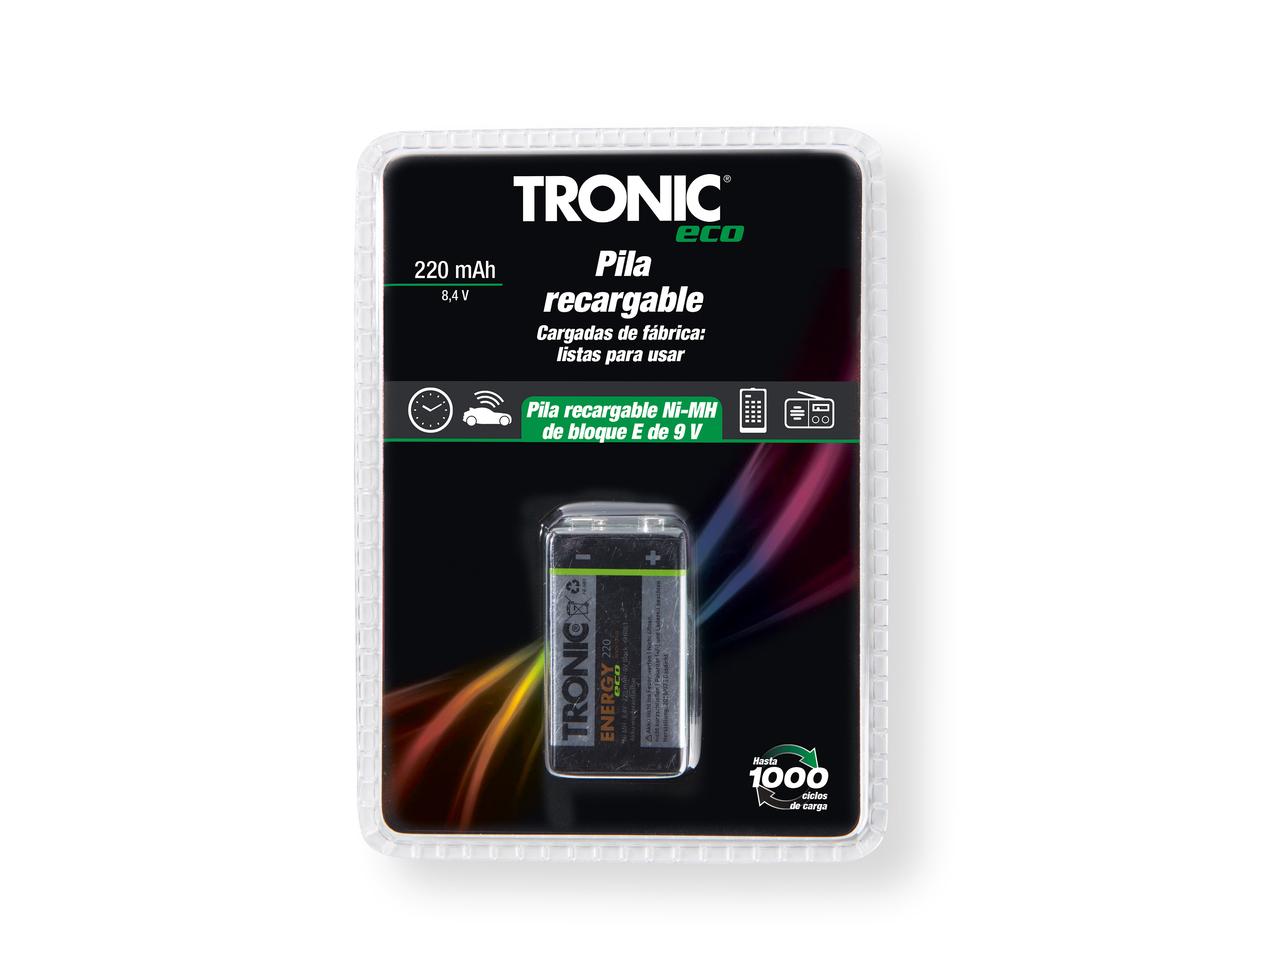 Baterías recargables Lidl Tronic